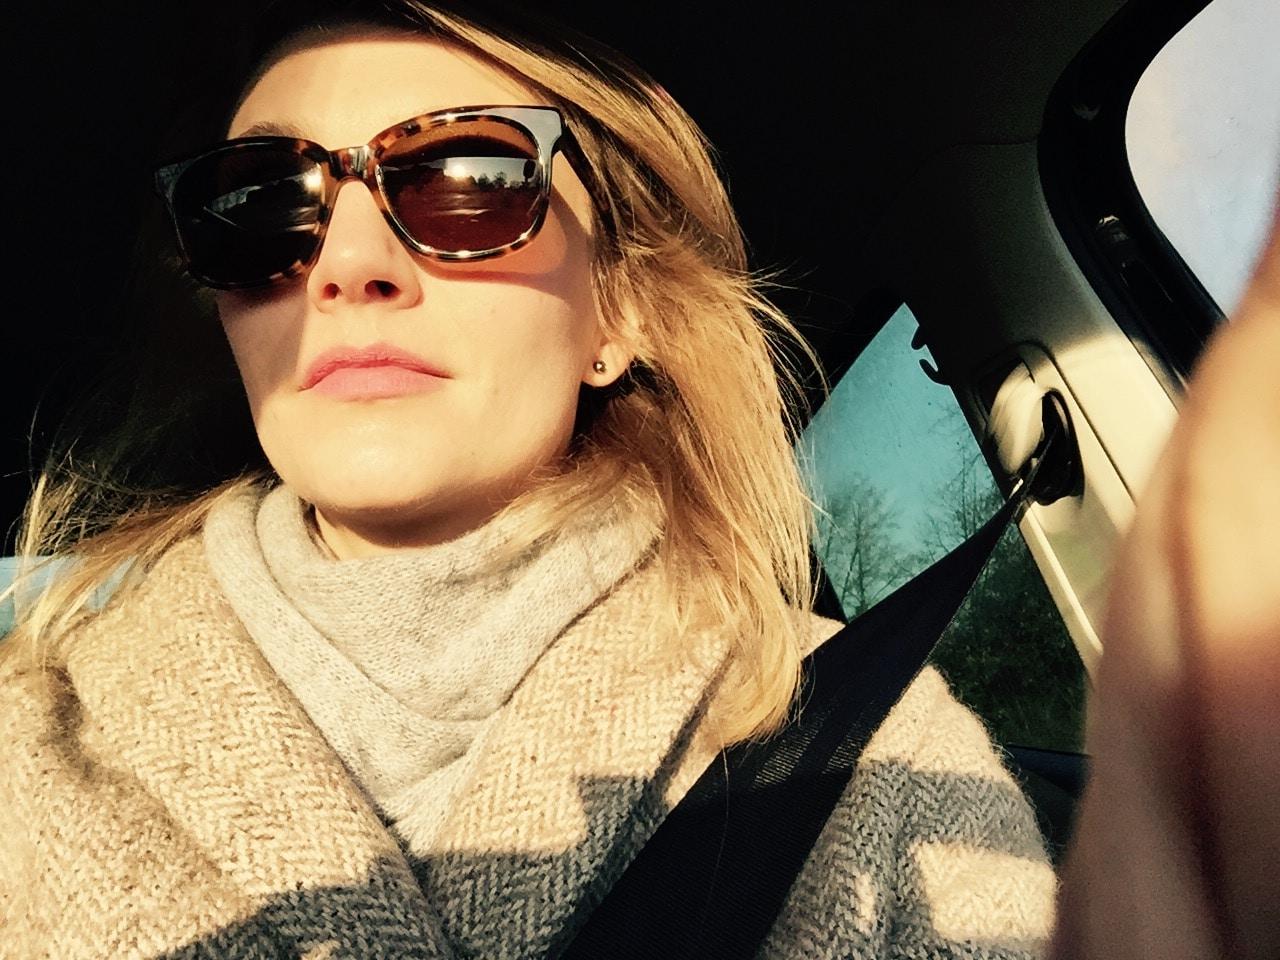 Go to Claire van Beuzekom's profile